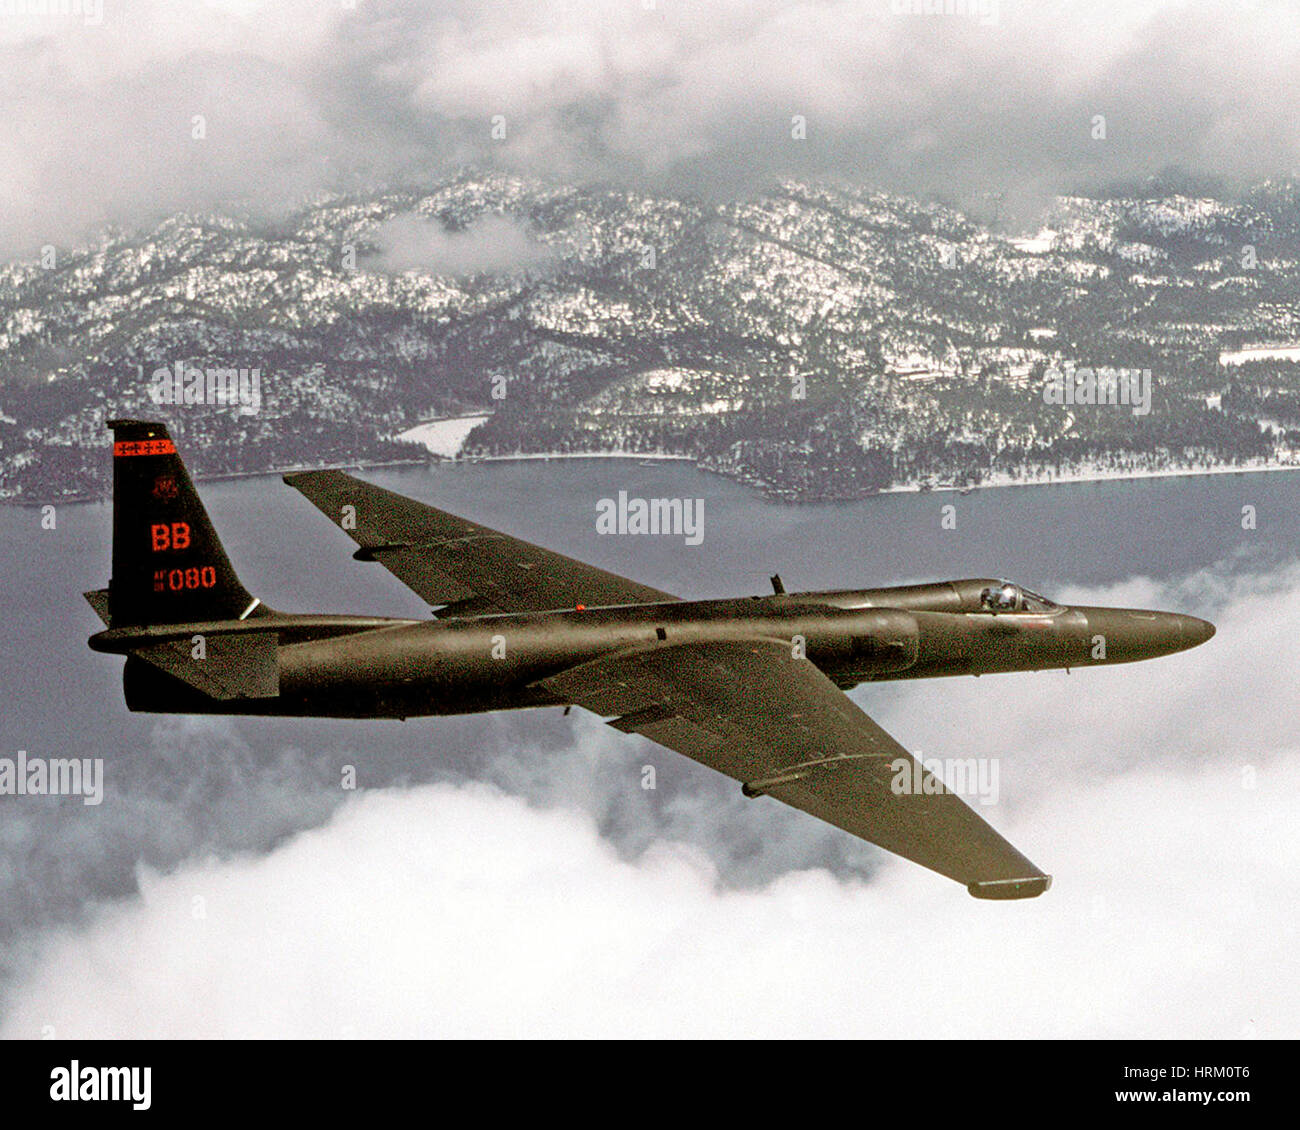 LOCKHEED U-2 reconnaissance aircraft. Photo: USAAF - Stock Image